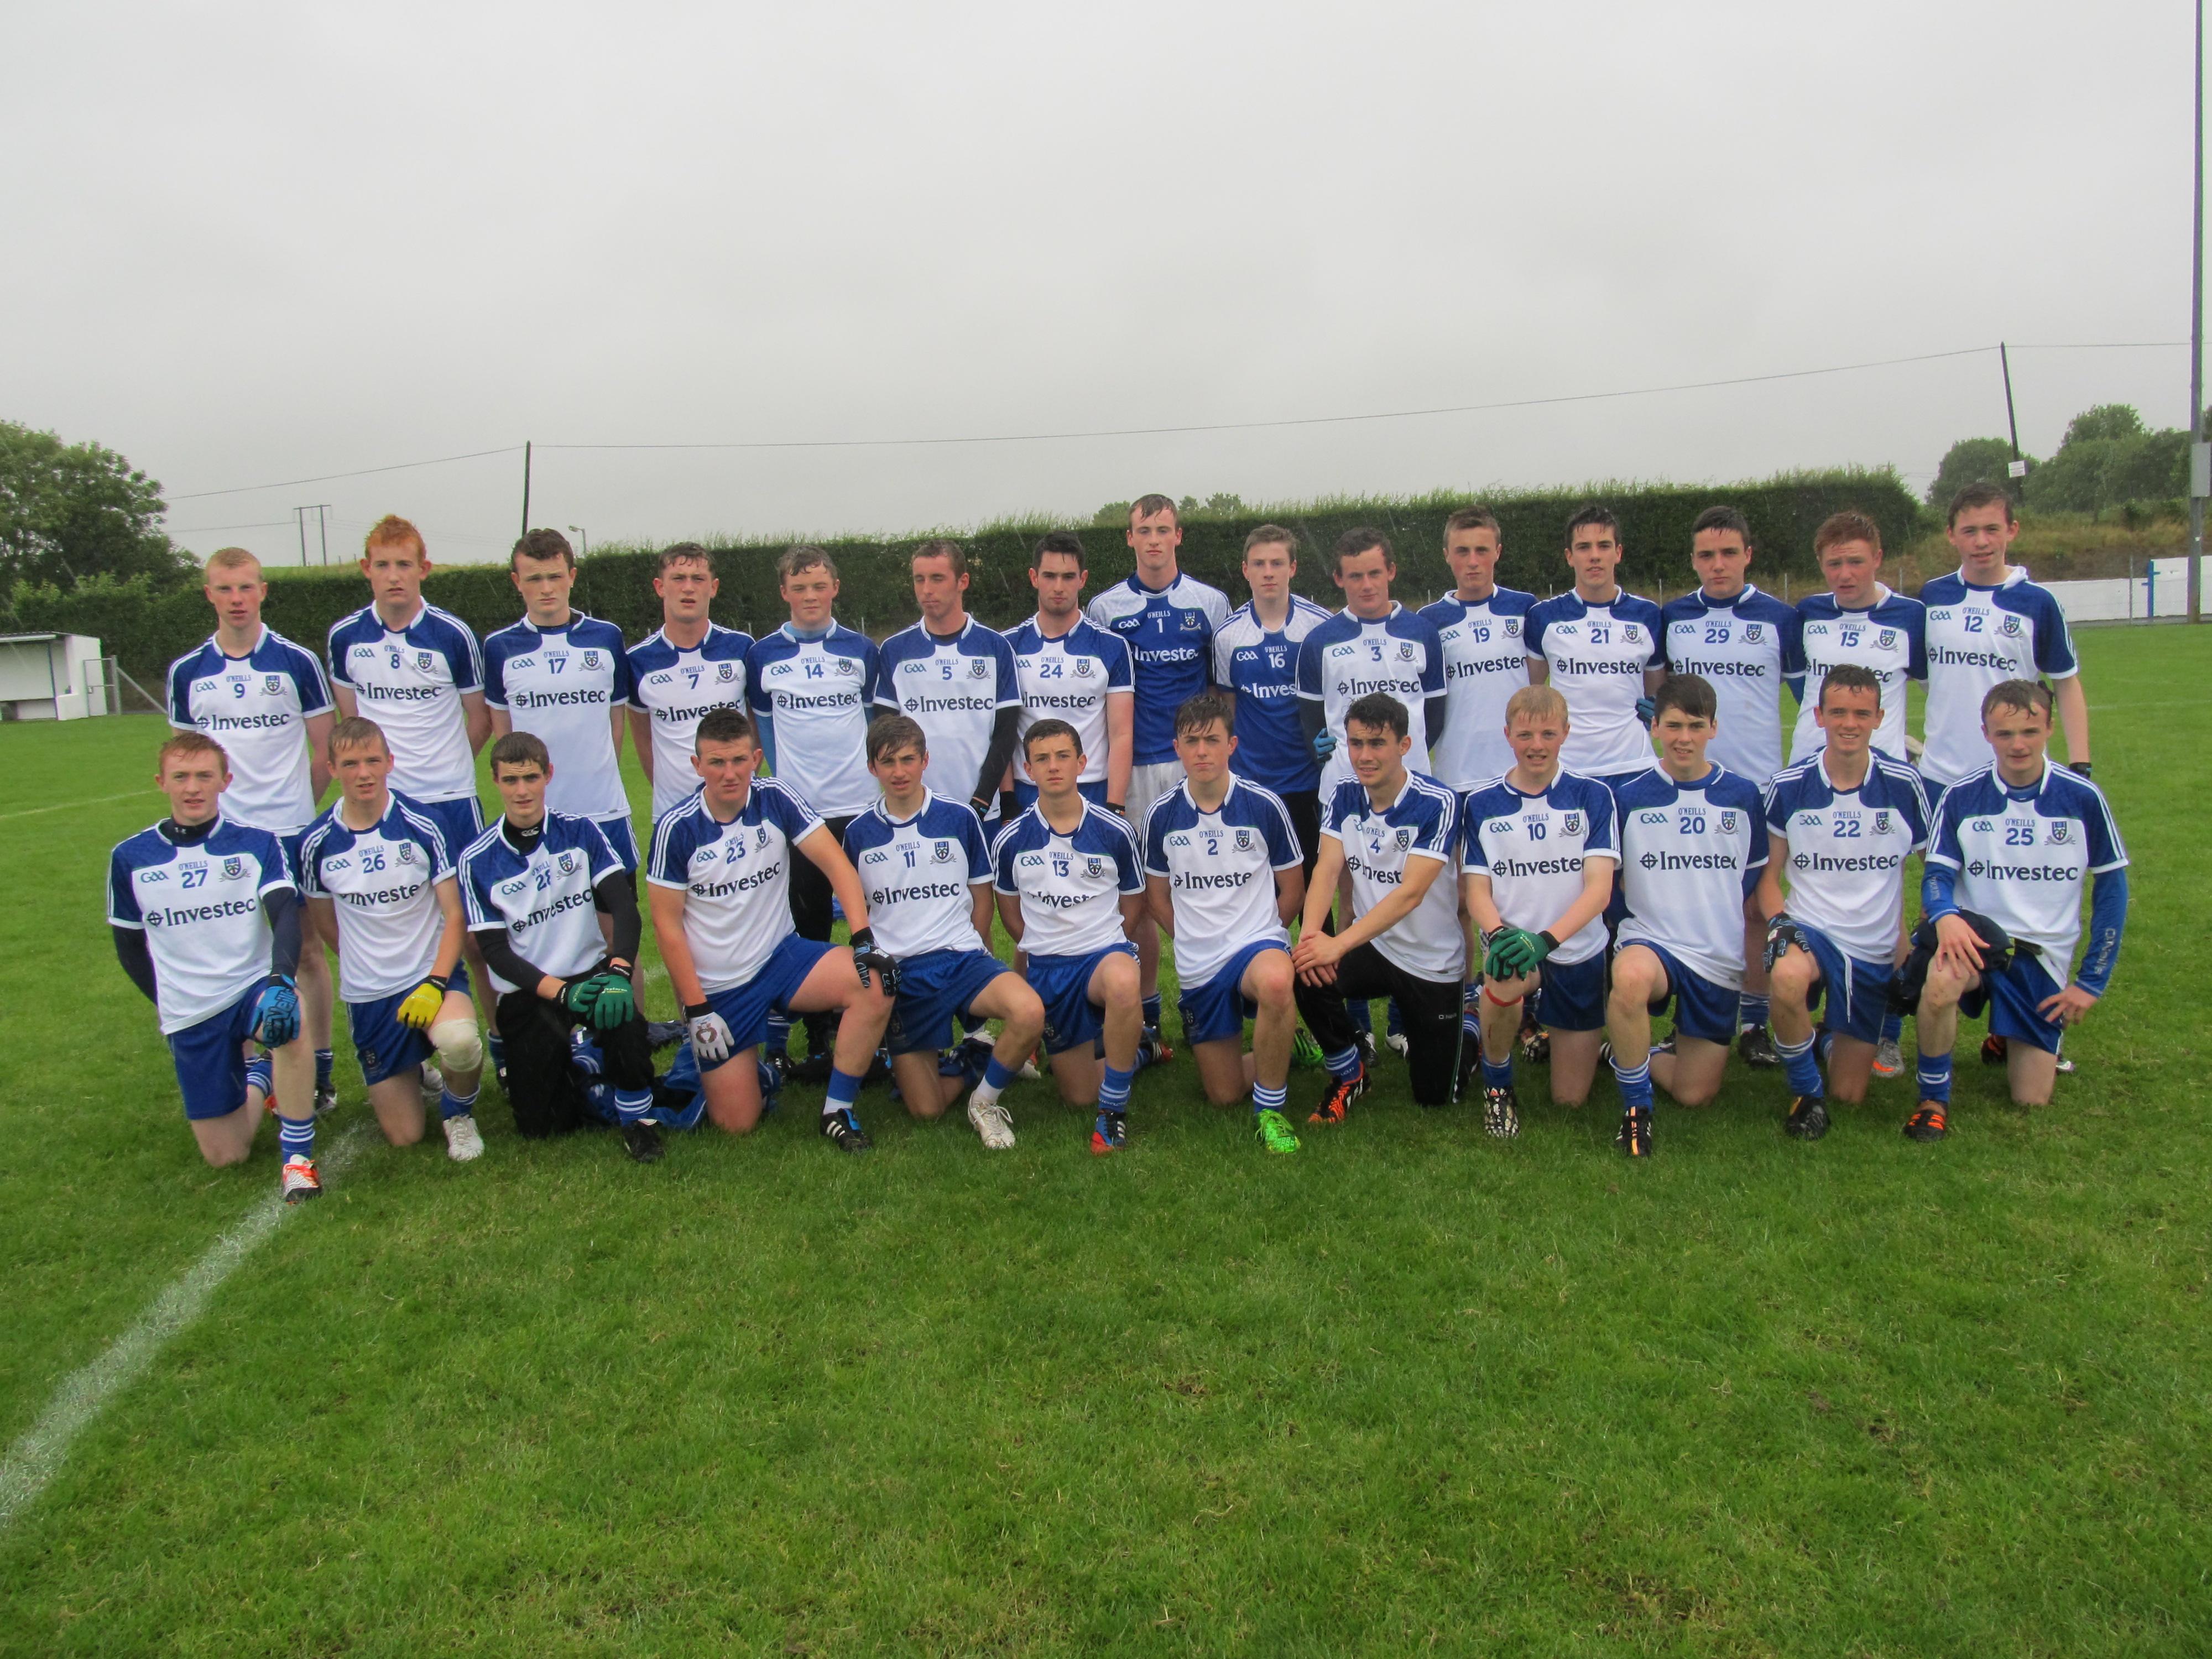 Monaghan U16 Development take Gerry Reilly Shield